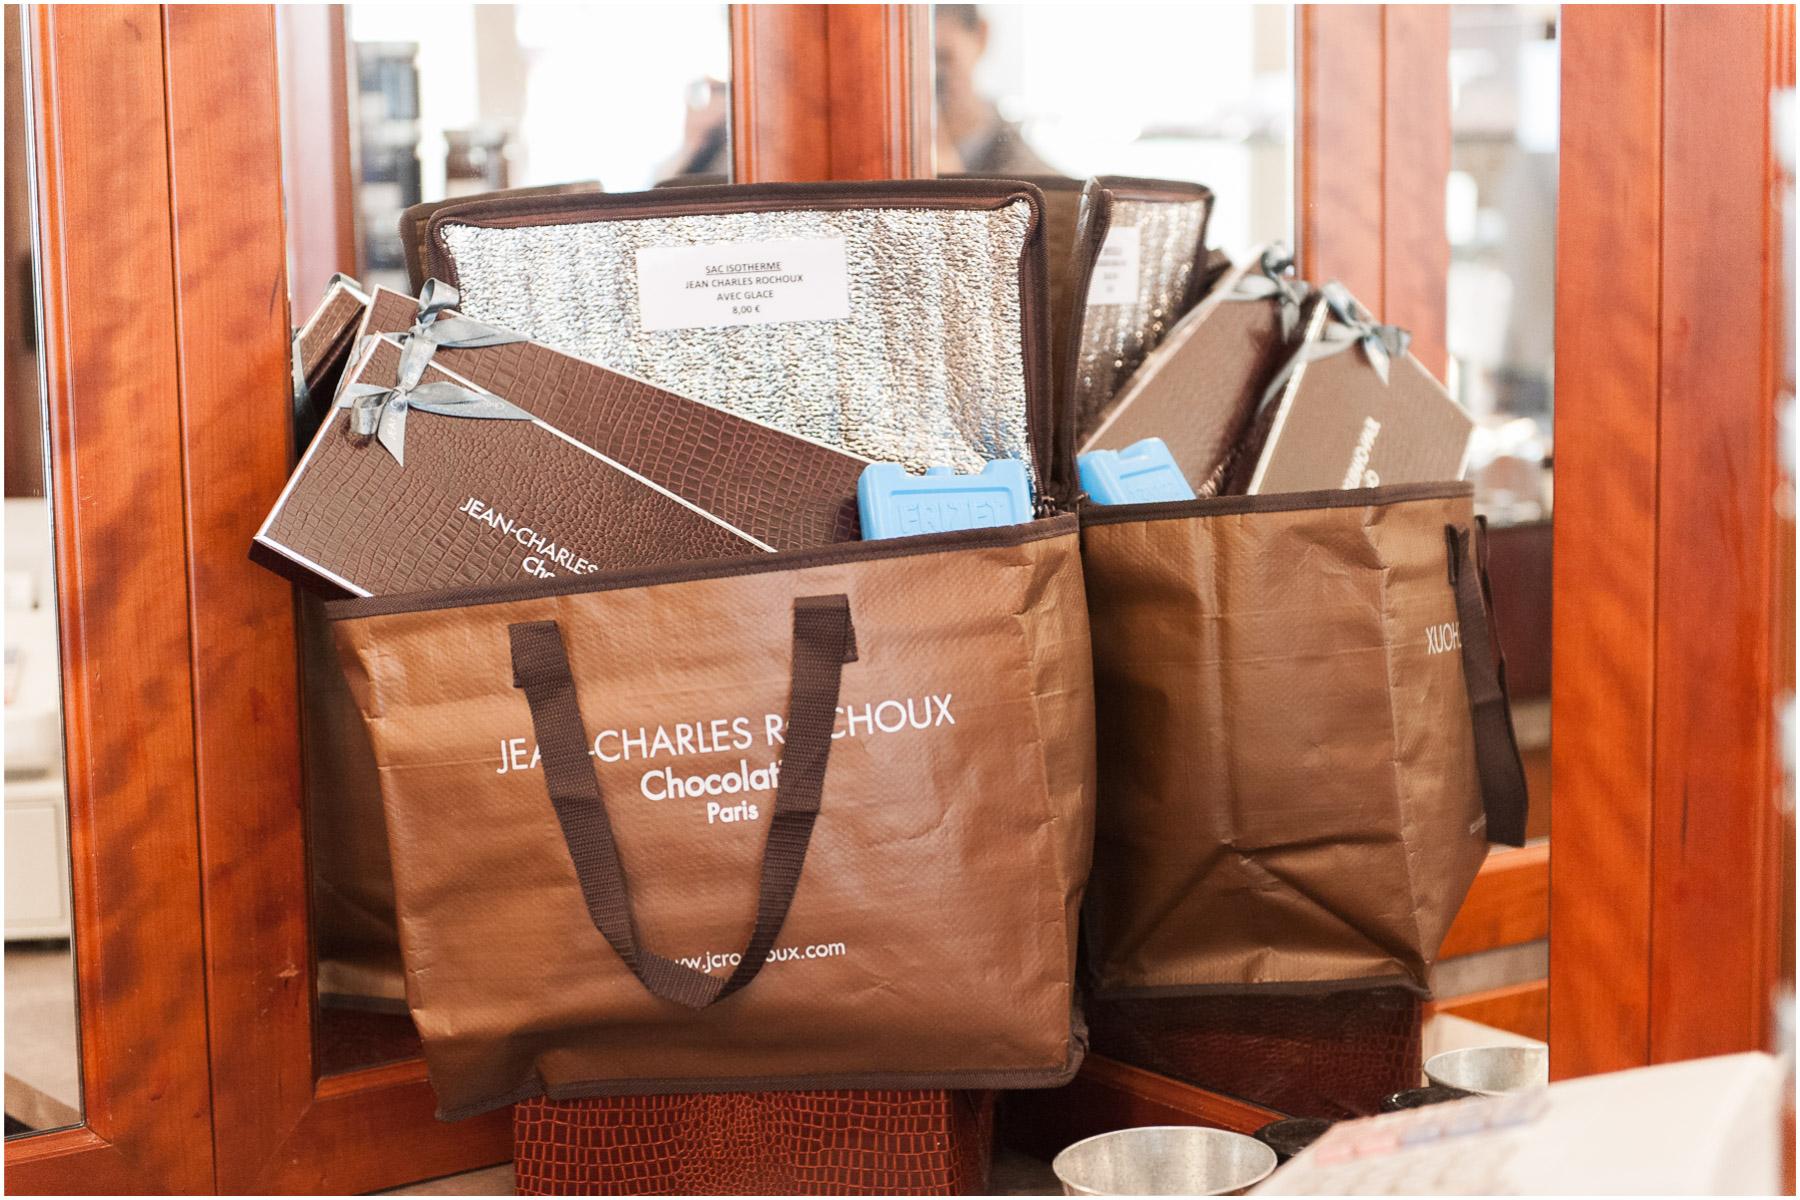 Parisian-Bakeris-Chocolate-Shop_15.jpg